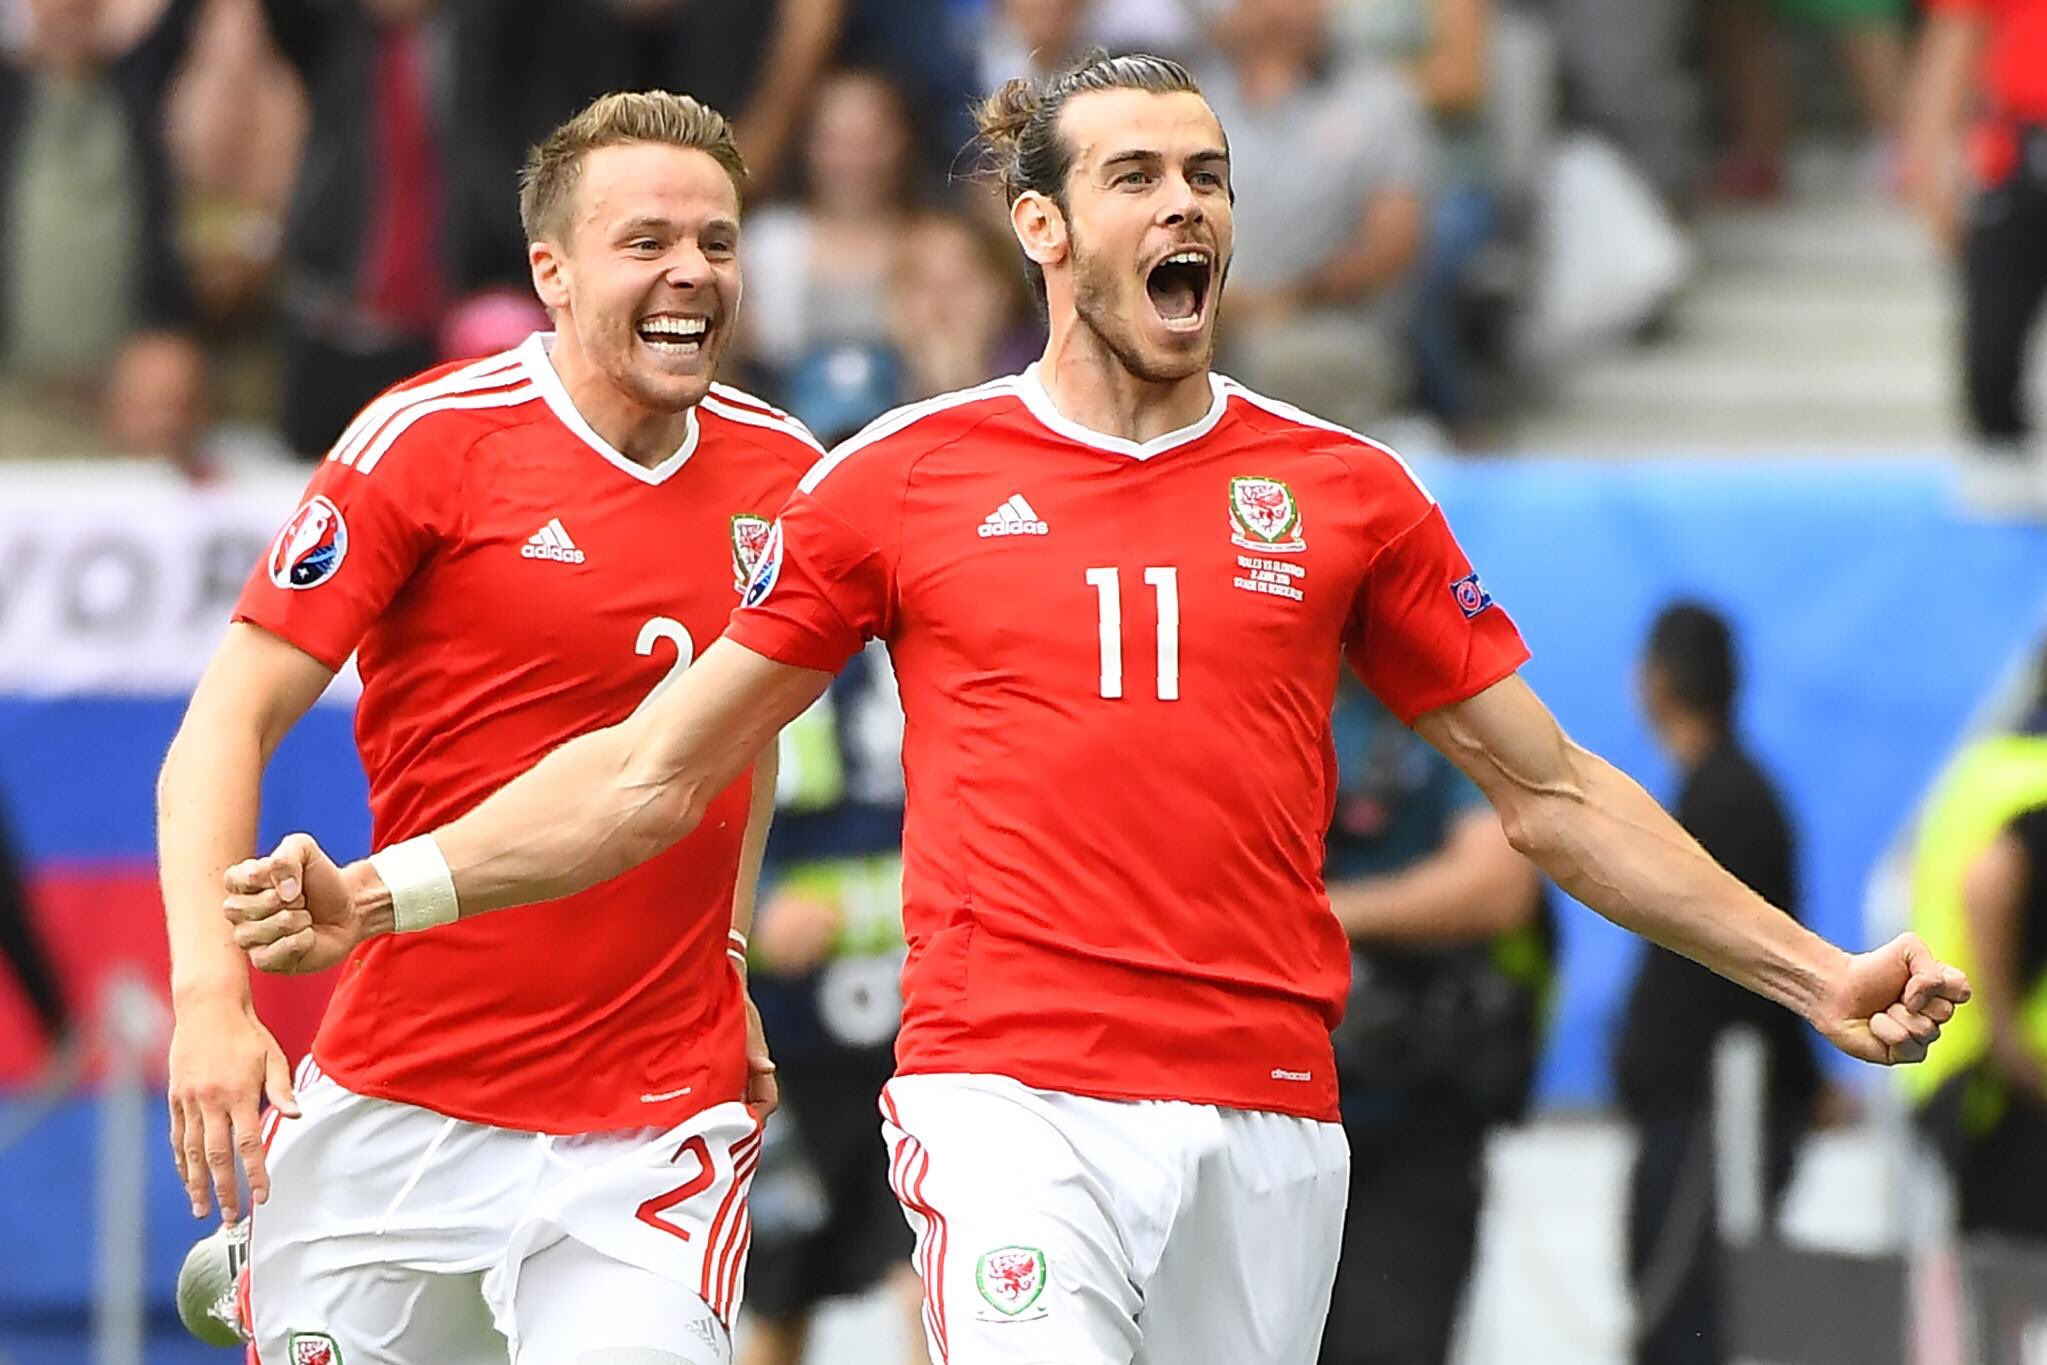 Euro 2016: Bale Scores As Wales Edge Slovakia